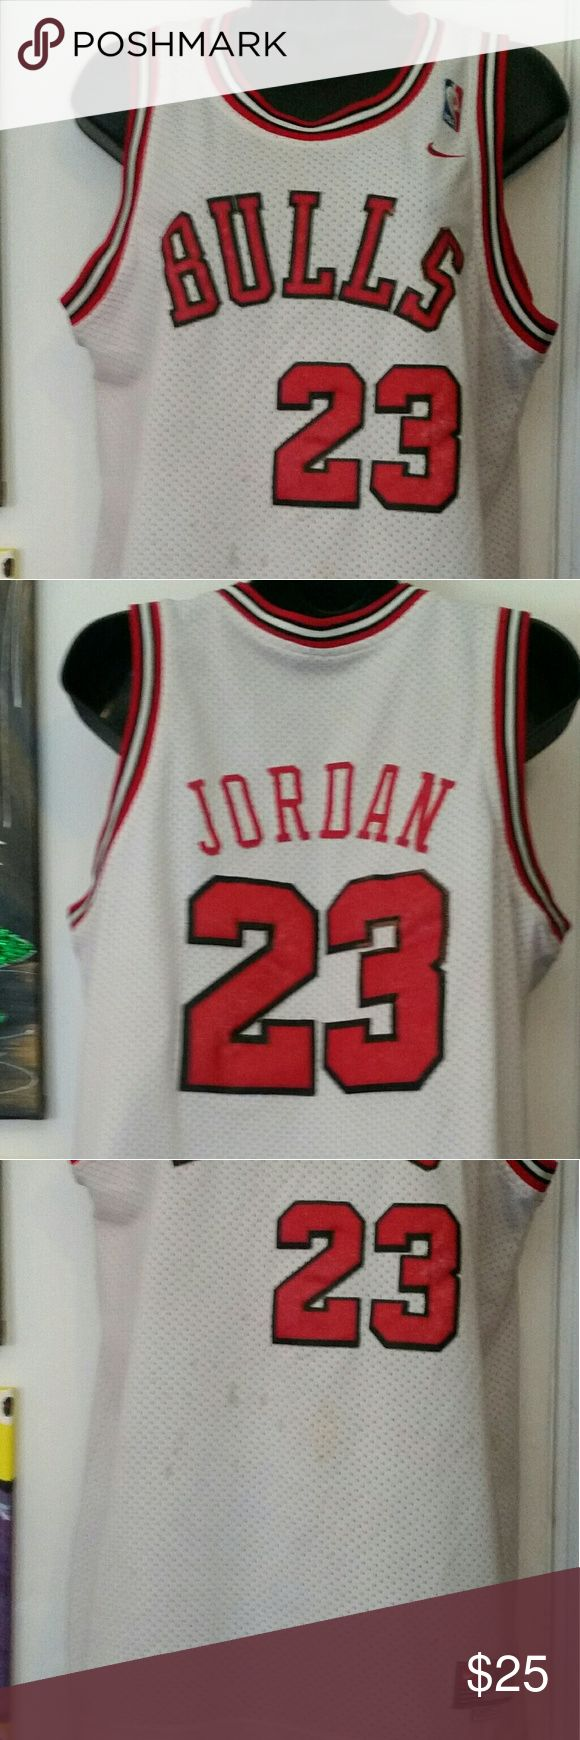 Jordan bulls jersey Jordan Bulls Jersey. Few spots on front. Large boys size Tops Tees - Short Sleeve